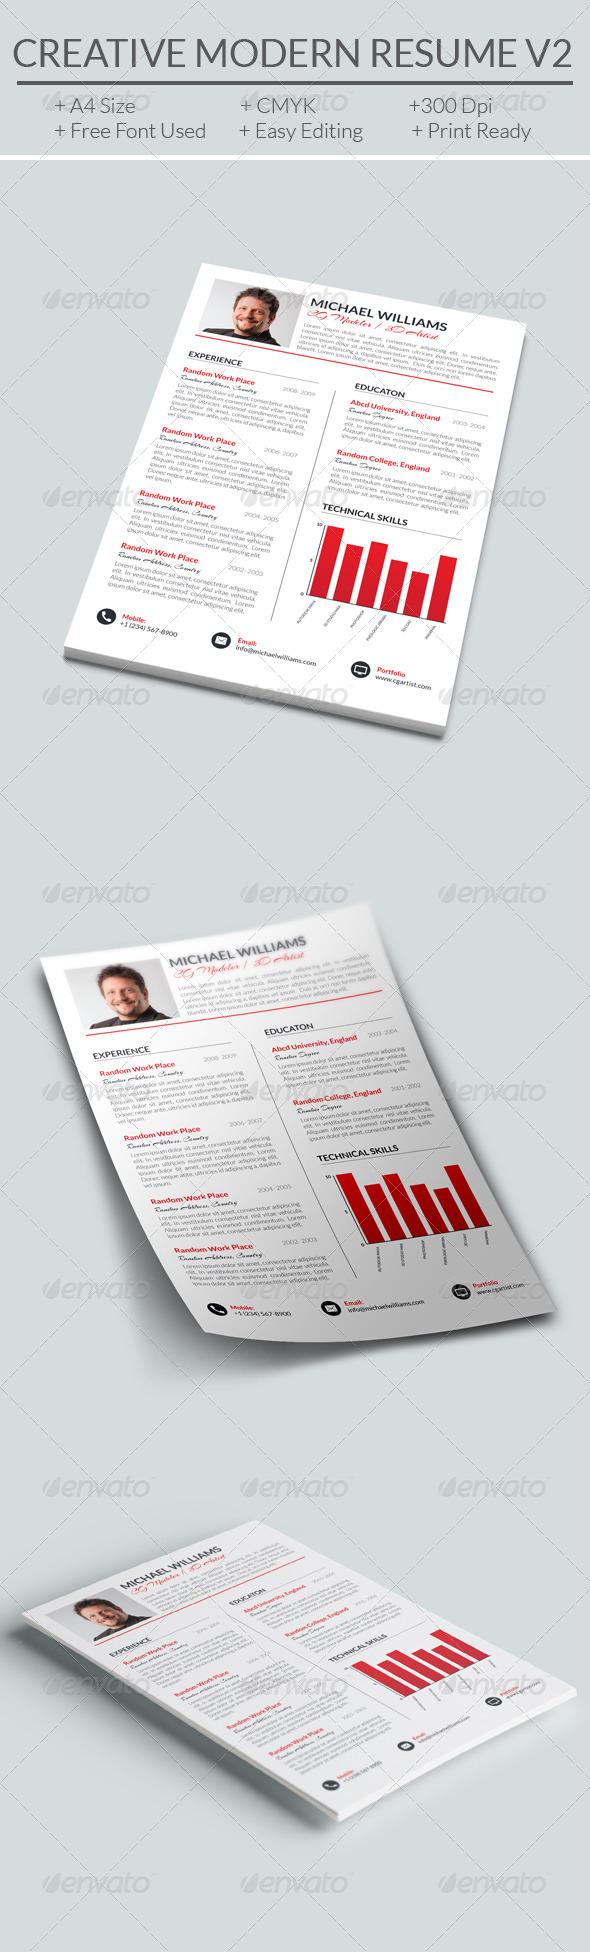 Creative Modern Resume V2